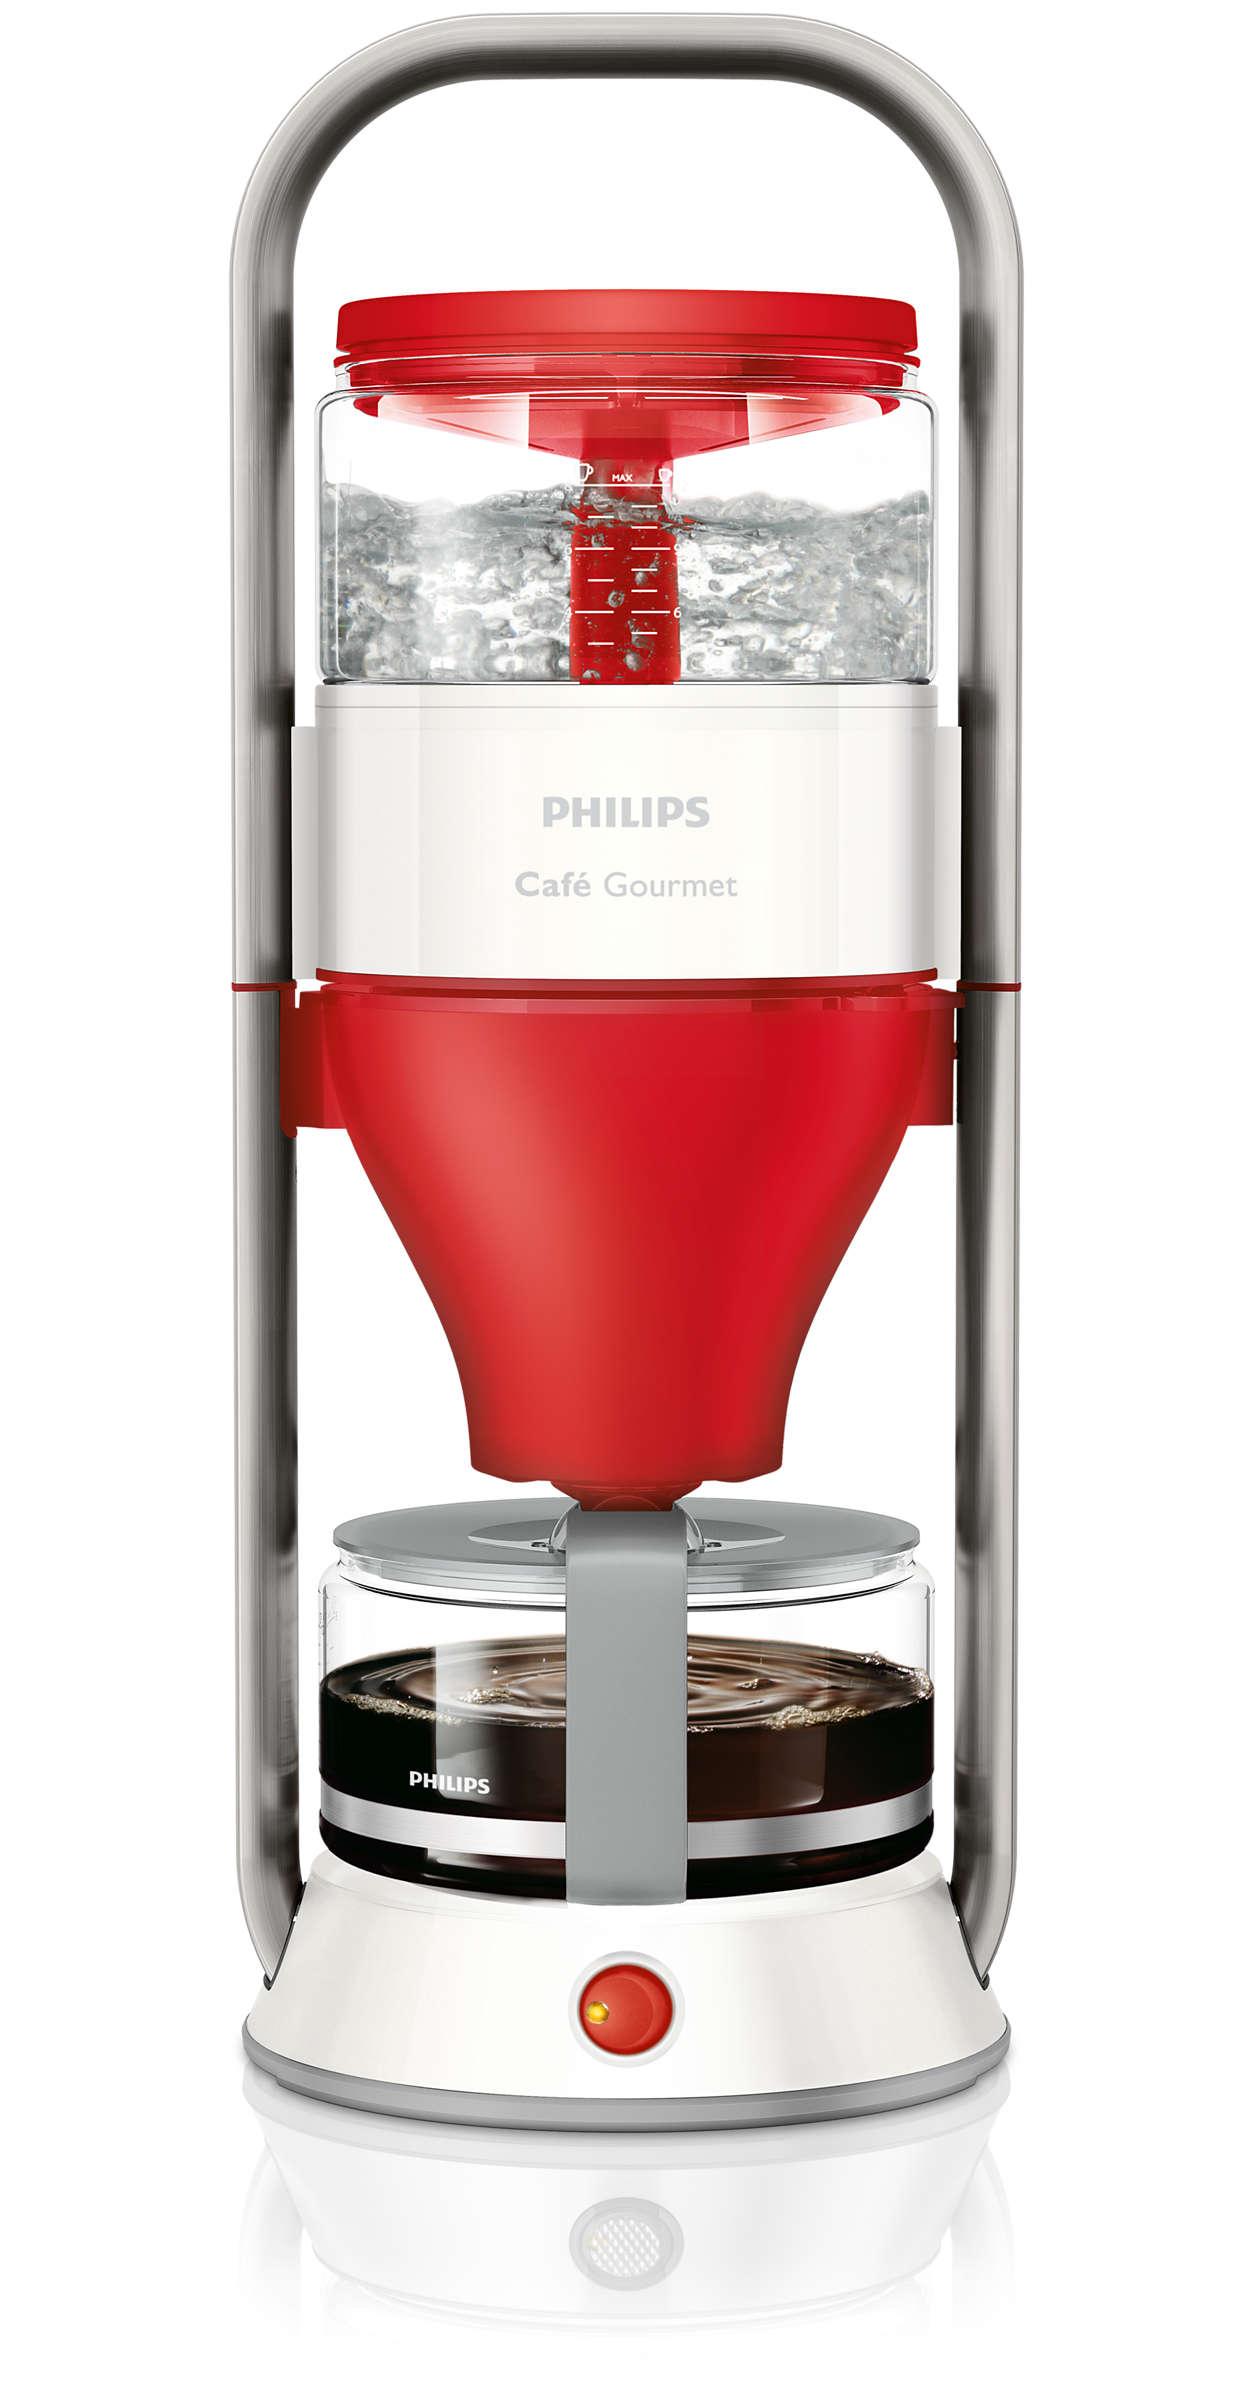 Okus ručno pripremljene kave iz filtra, od 1988.